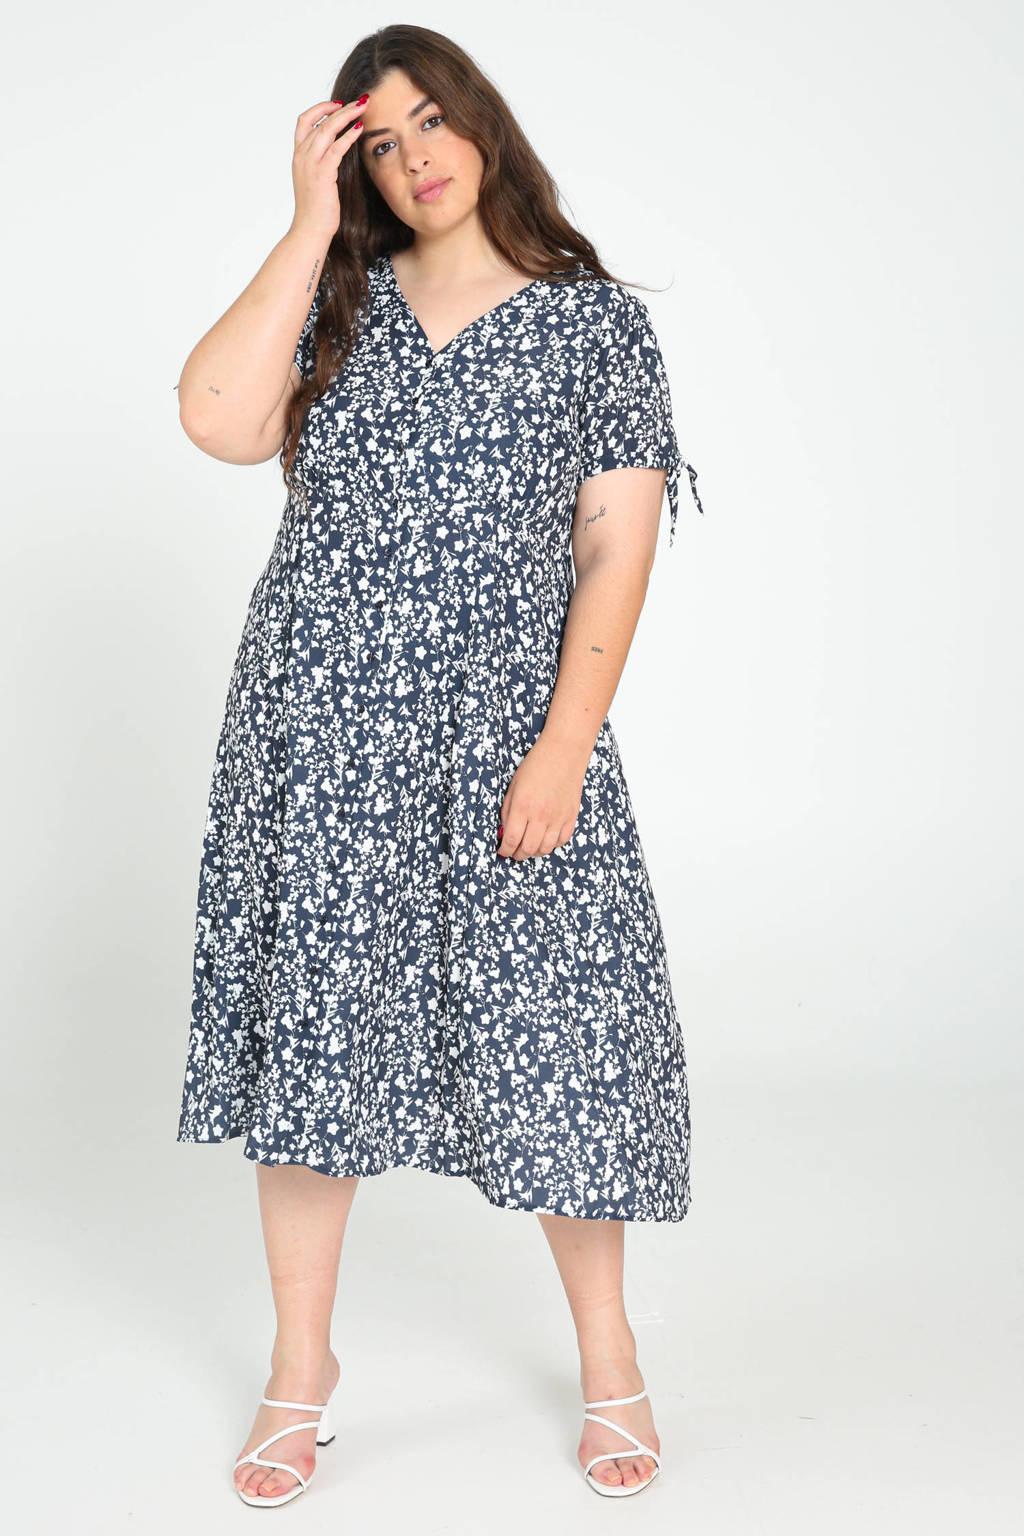 Paprika maxi jurk met all over print marine/wit, Marine/wit